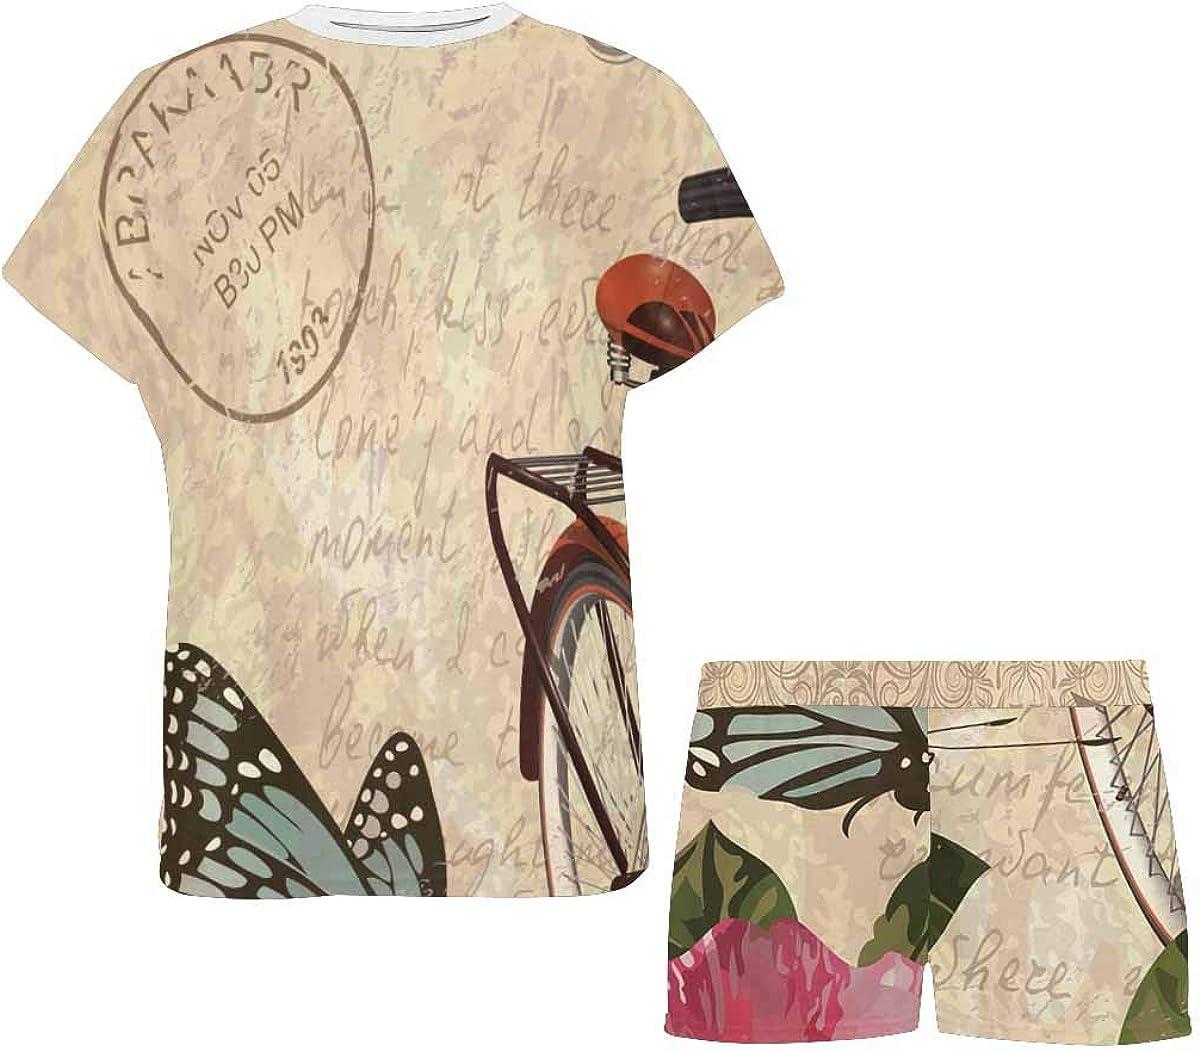 InterestPrint Vintage Roses Butterflies and Bicycle Women's Lightweight Pajama Set, Short Summer Pjs